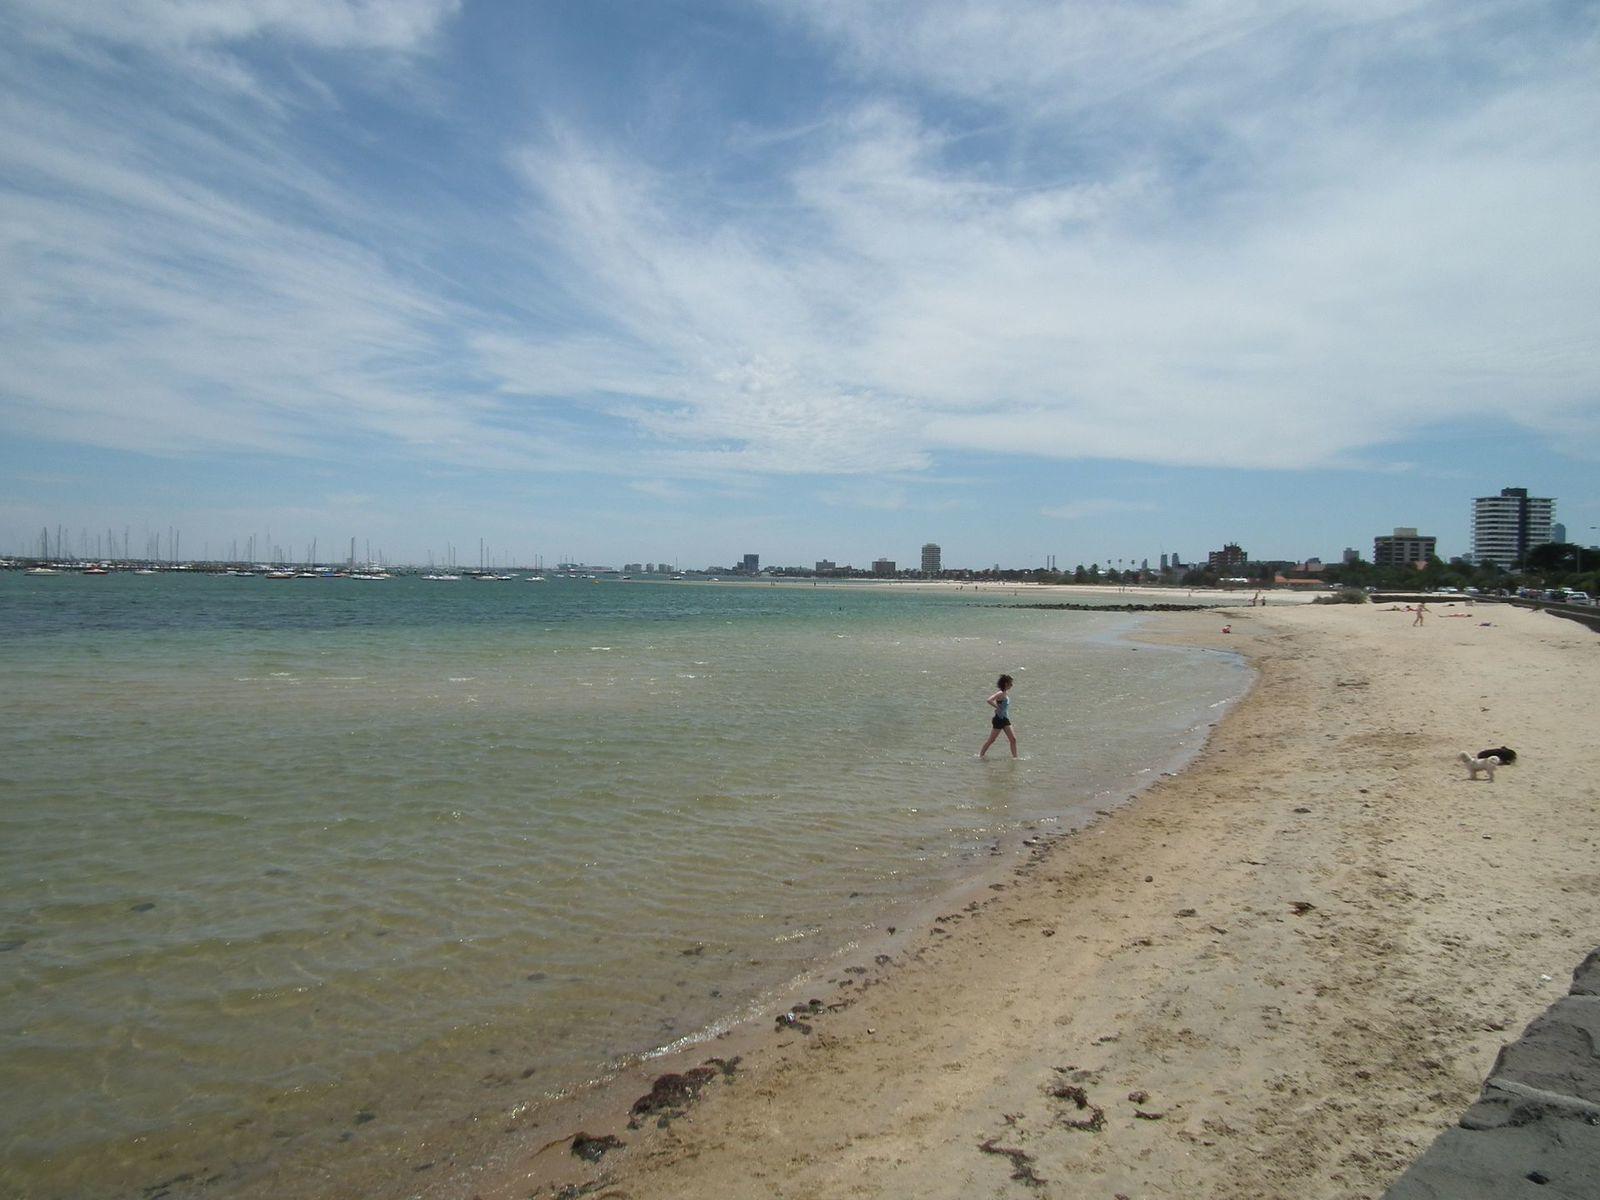 Adieu Melbourne, St Kilda